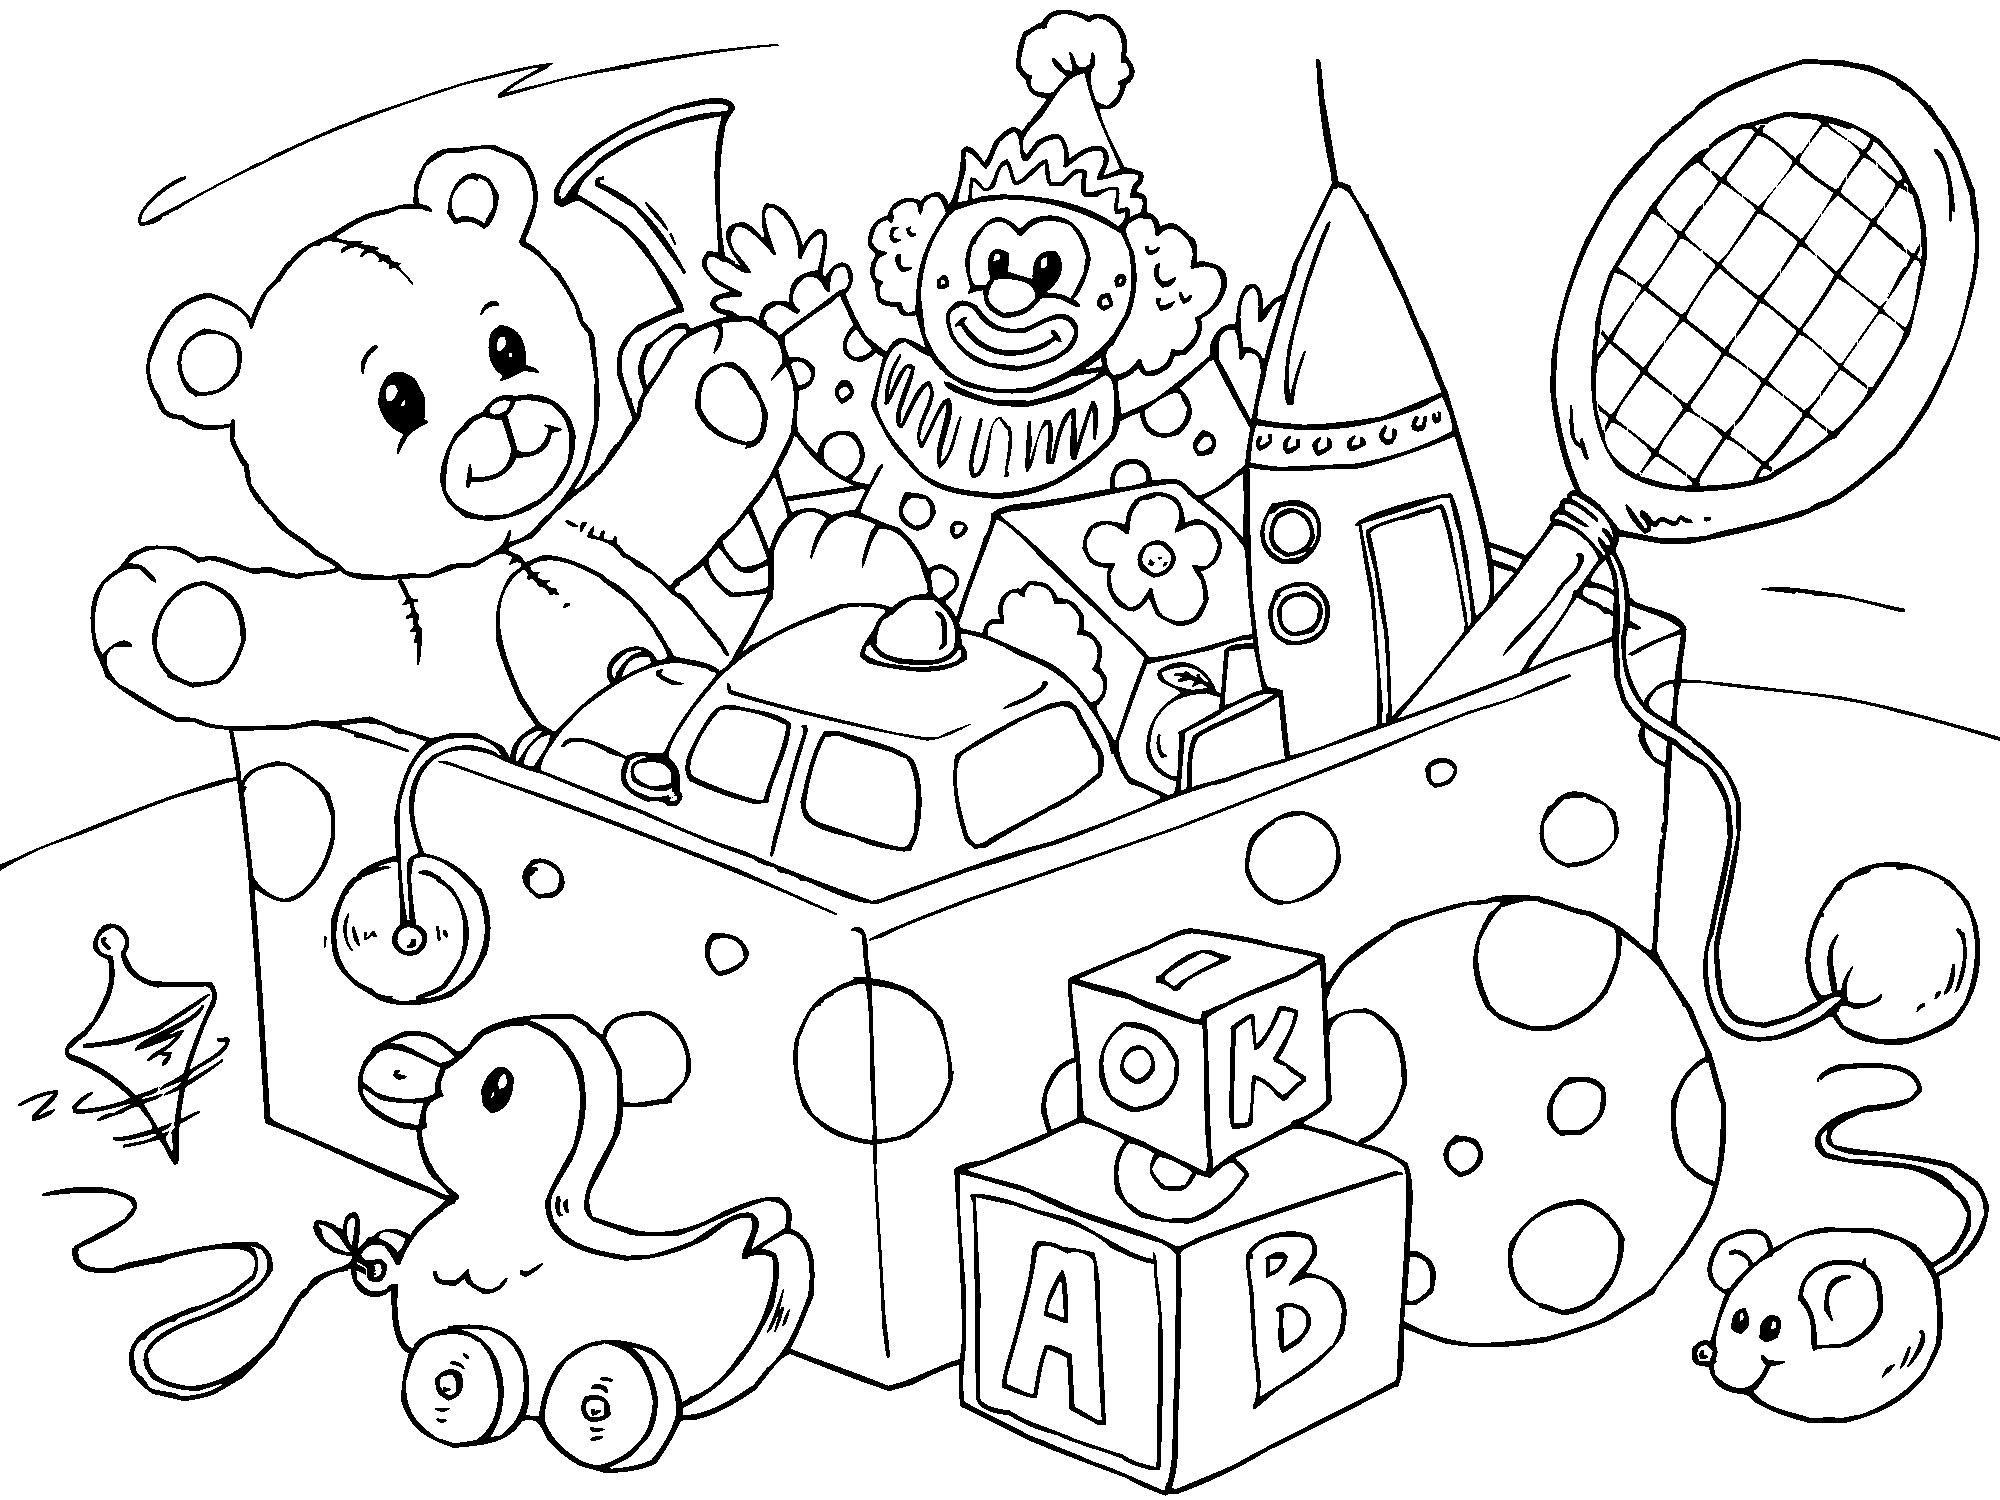 Coloriage jouet img 22821 - Coloriage minnie jouet ...